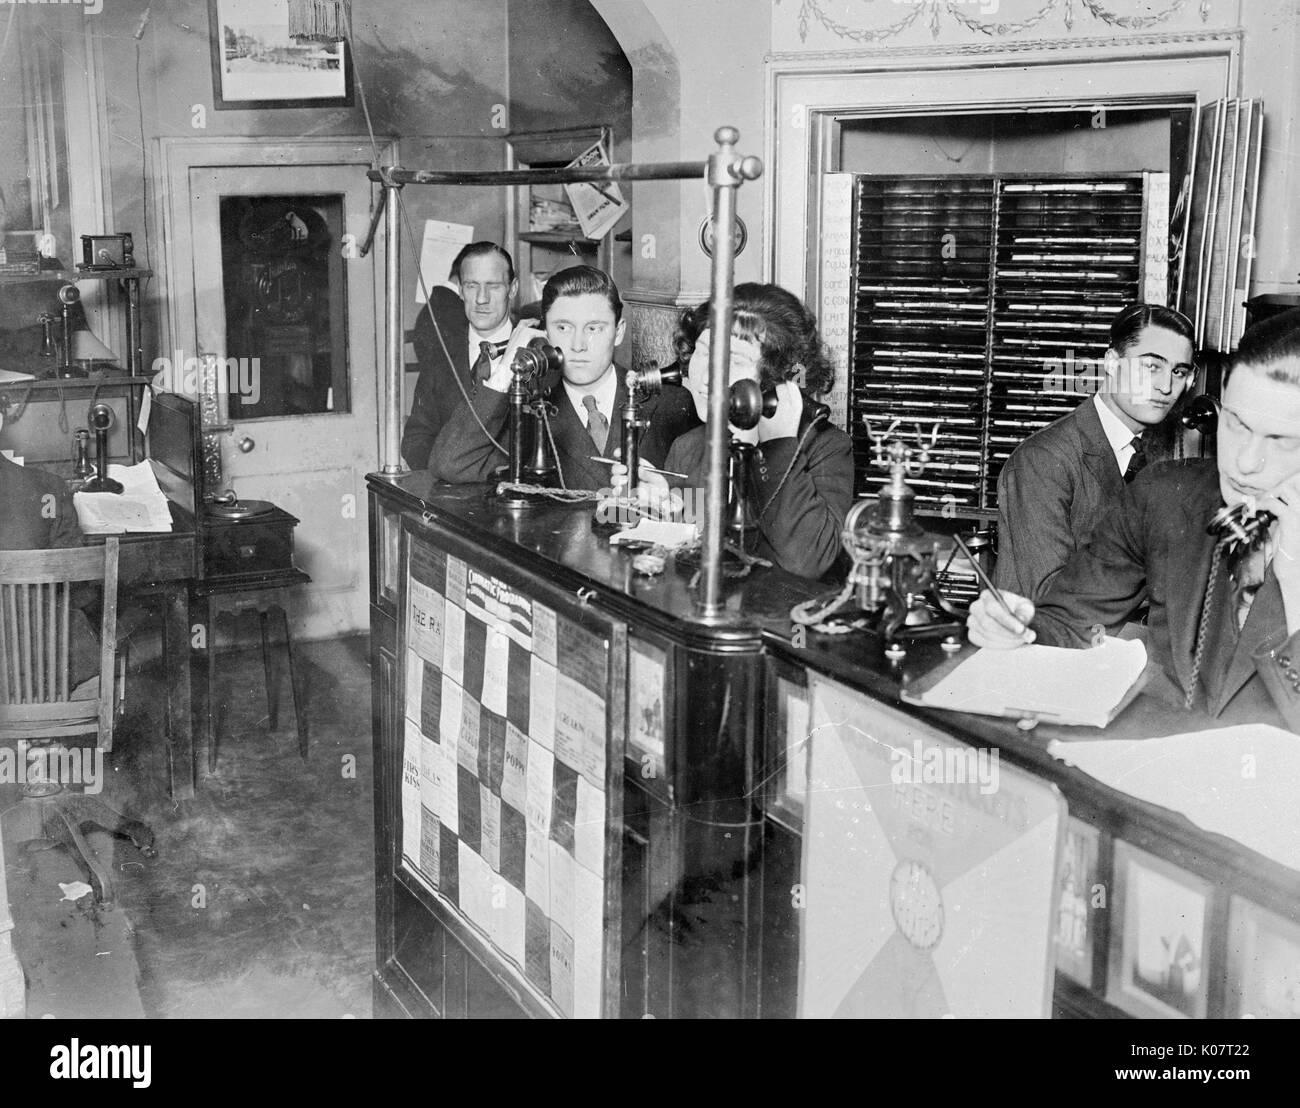 Gesellschaft für Unterhalter, mit Webster & Girling Ltd Theater ticket Box Office, obere Baker Street, Stockbild